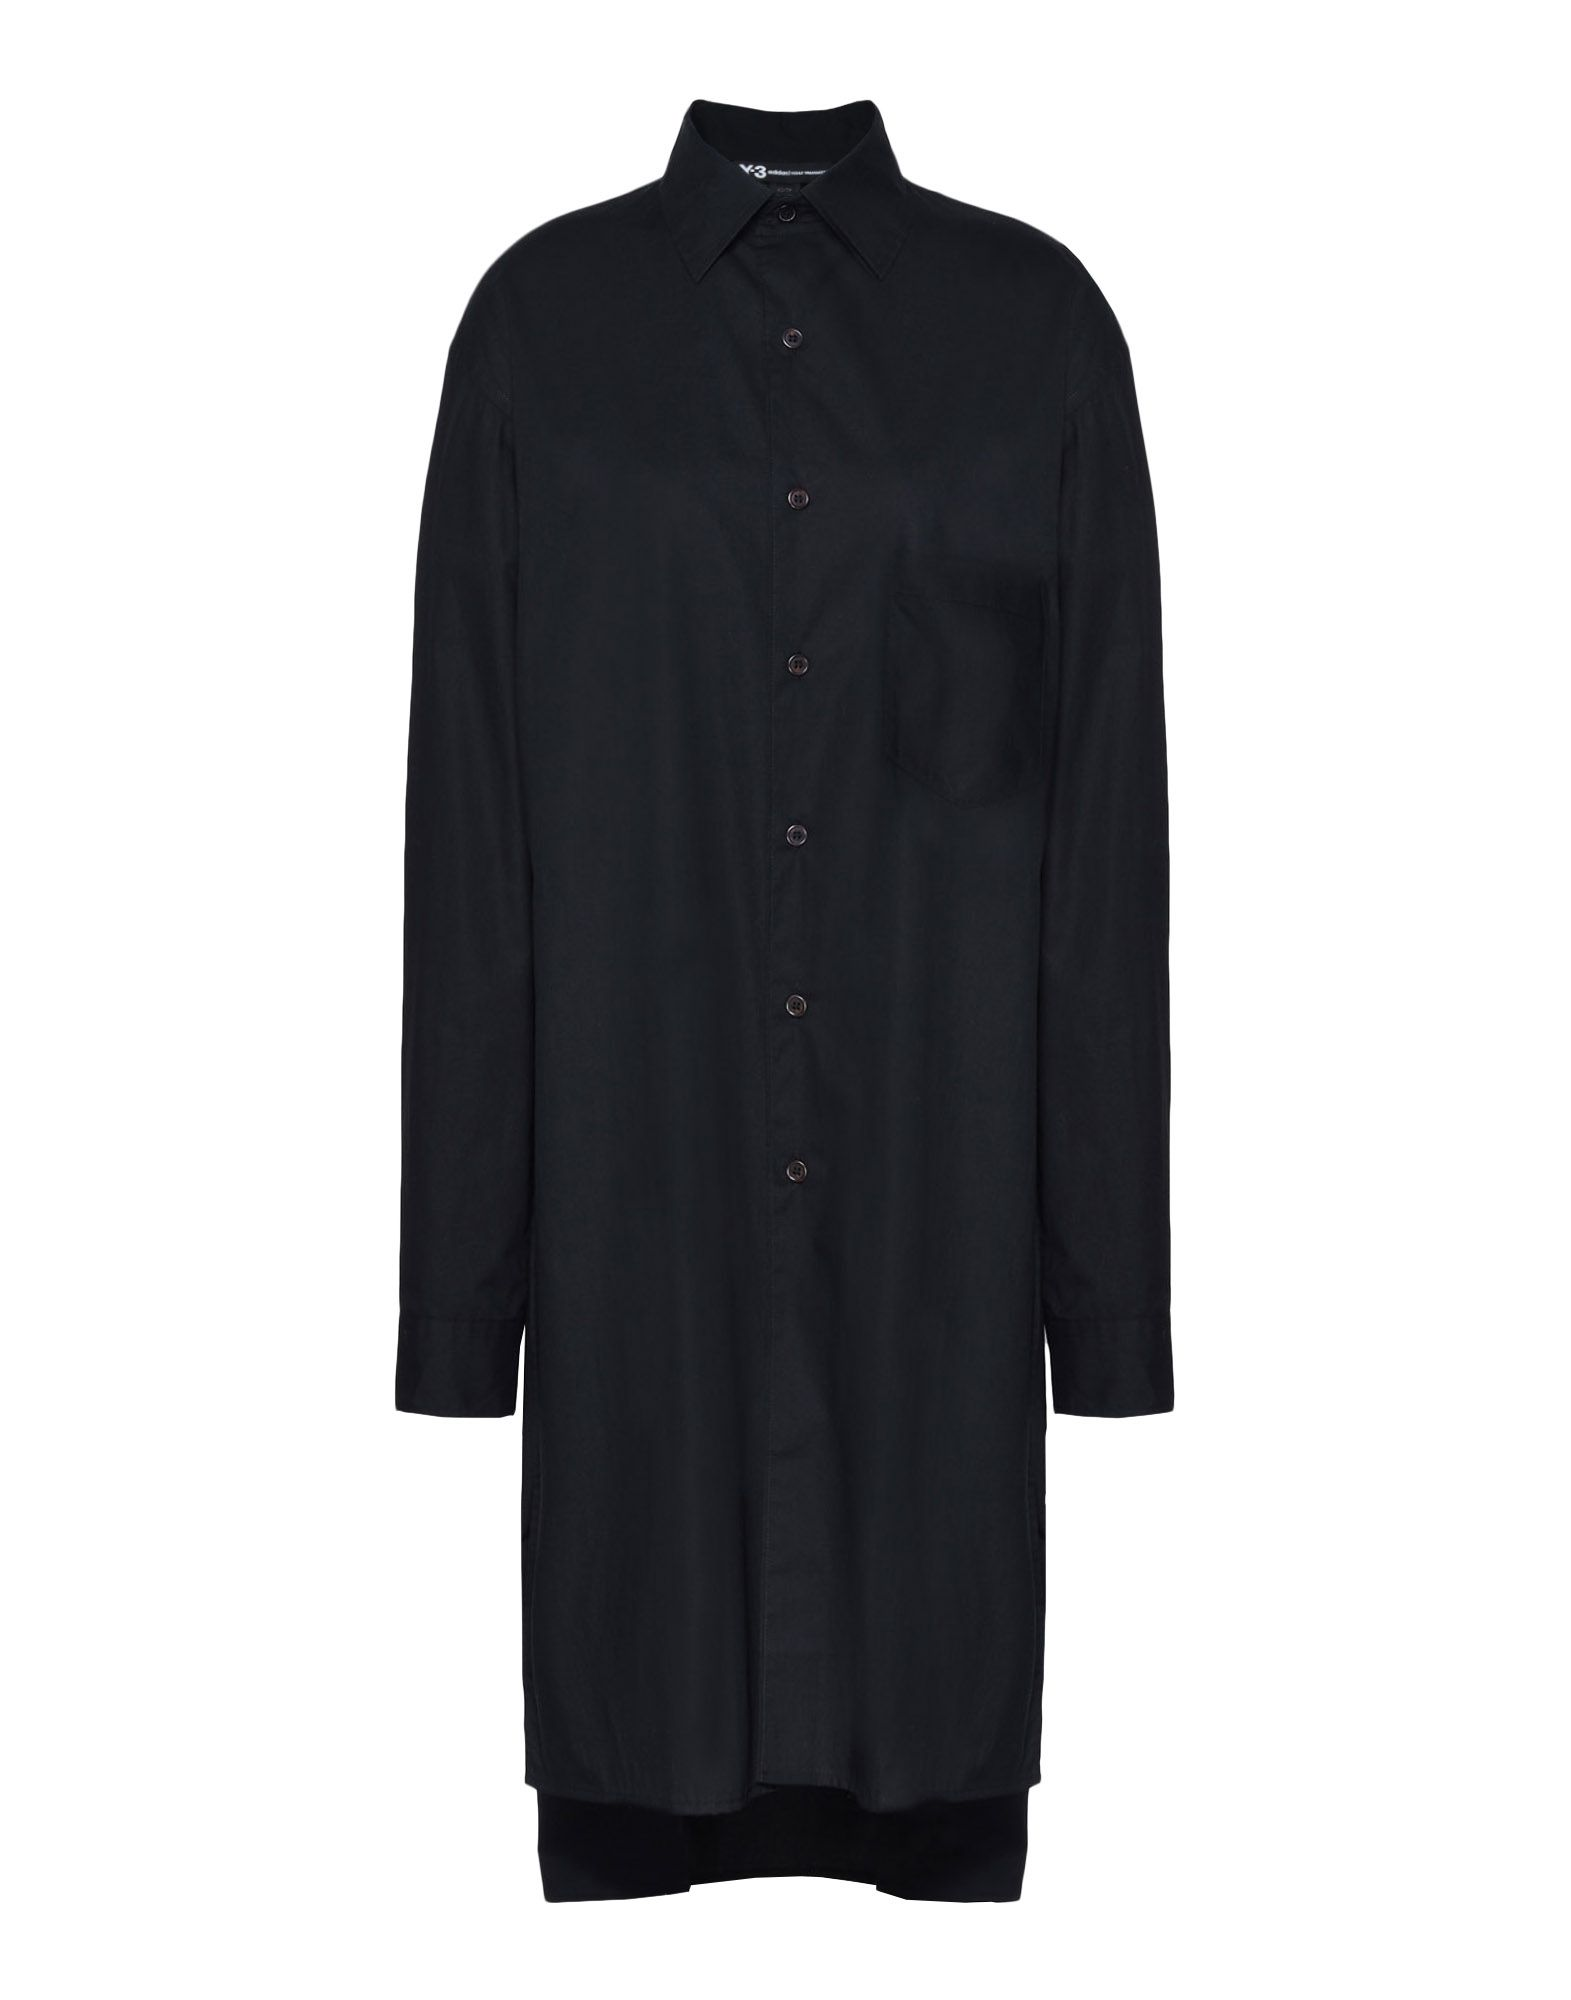 Y-3 Y-3 Stacked Logo Shirt Long sleeve shirt Woman f